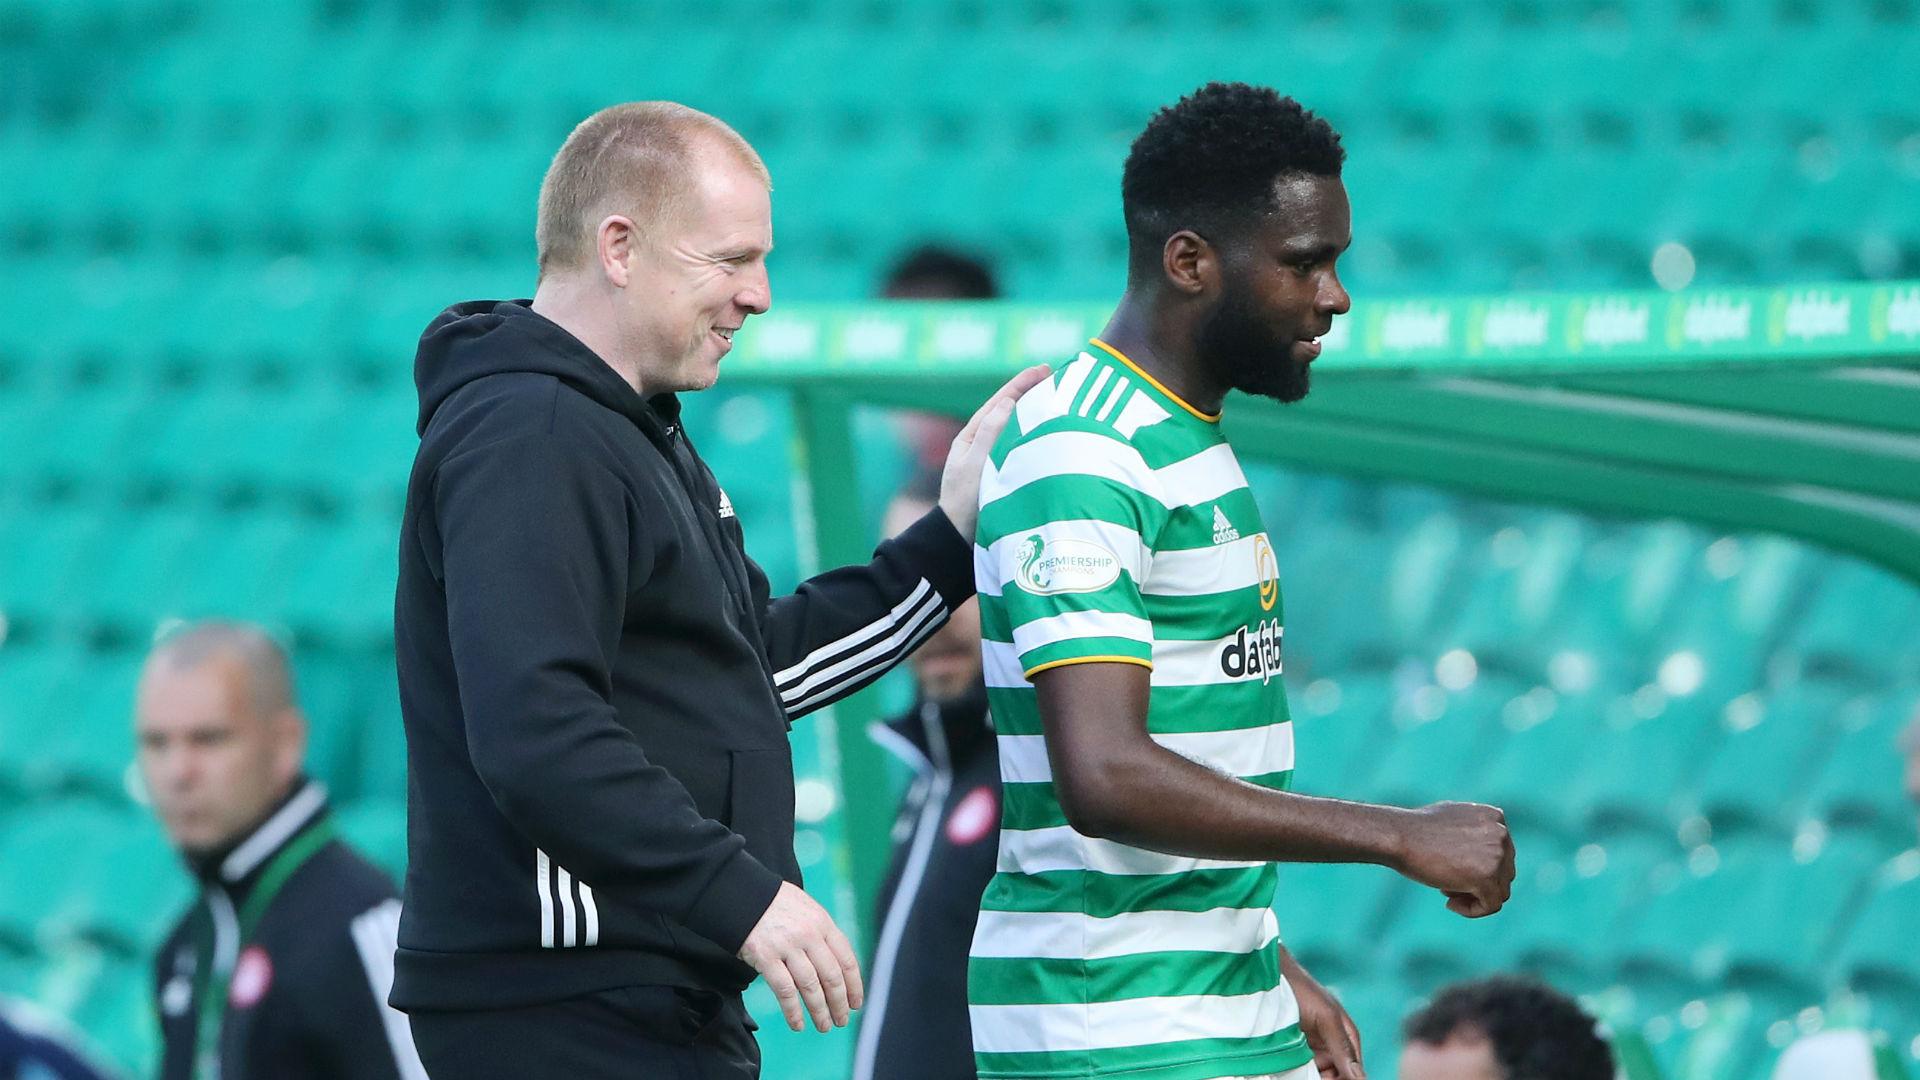 Celtic boss Lennon braced for Edouard bids after hat-trick